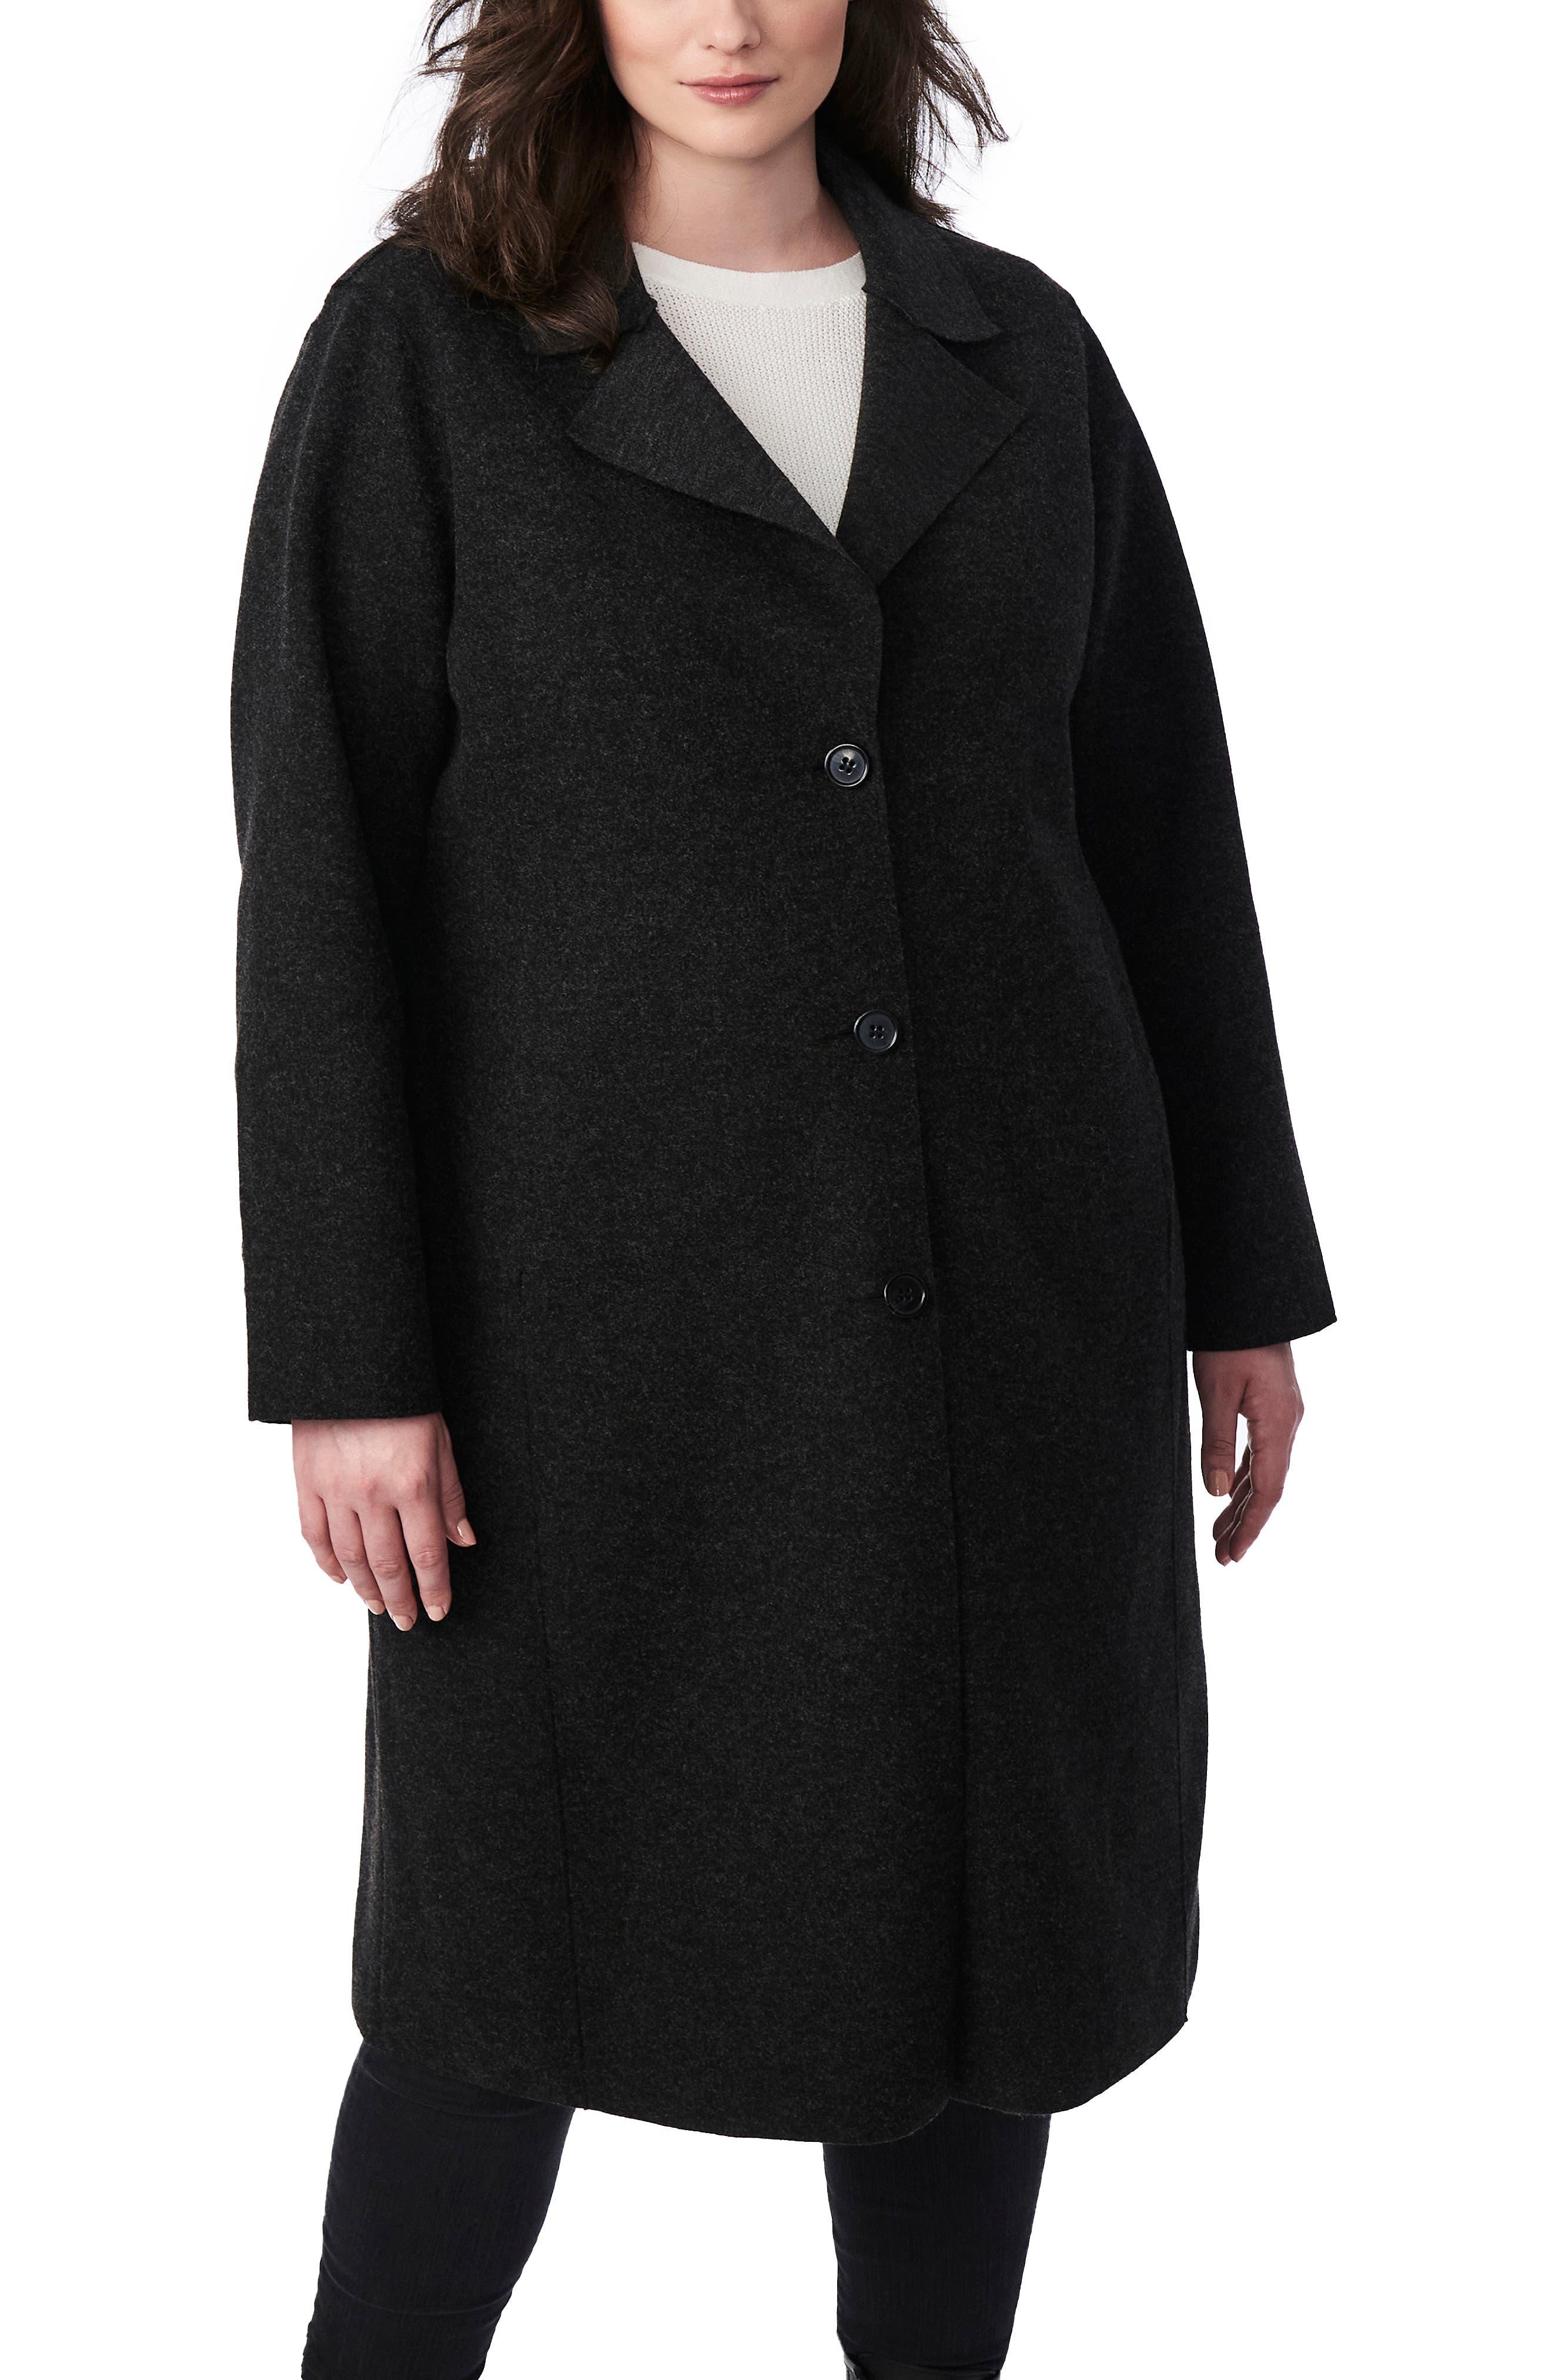 1920s Coats, Flapper Coats, 20s Jackets Plus Size Womens Bernardo Sweater Long Coat $136.90 AT vintagedancer.com